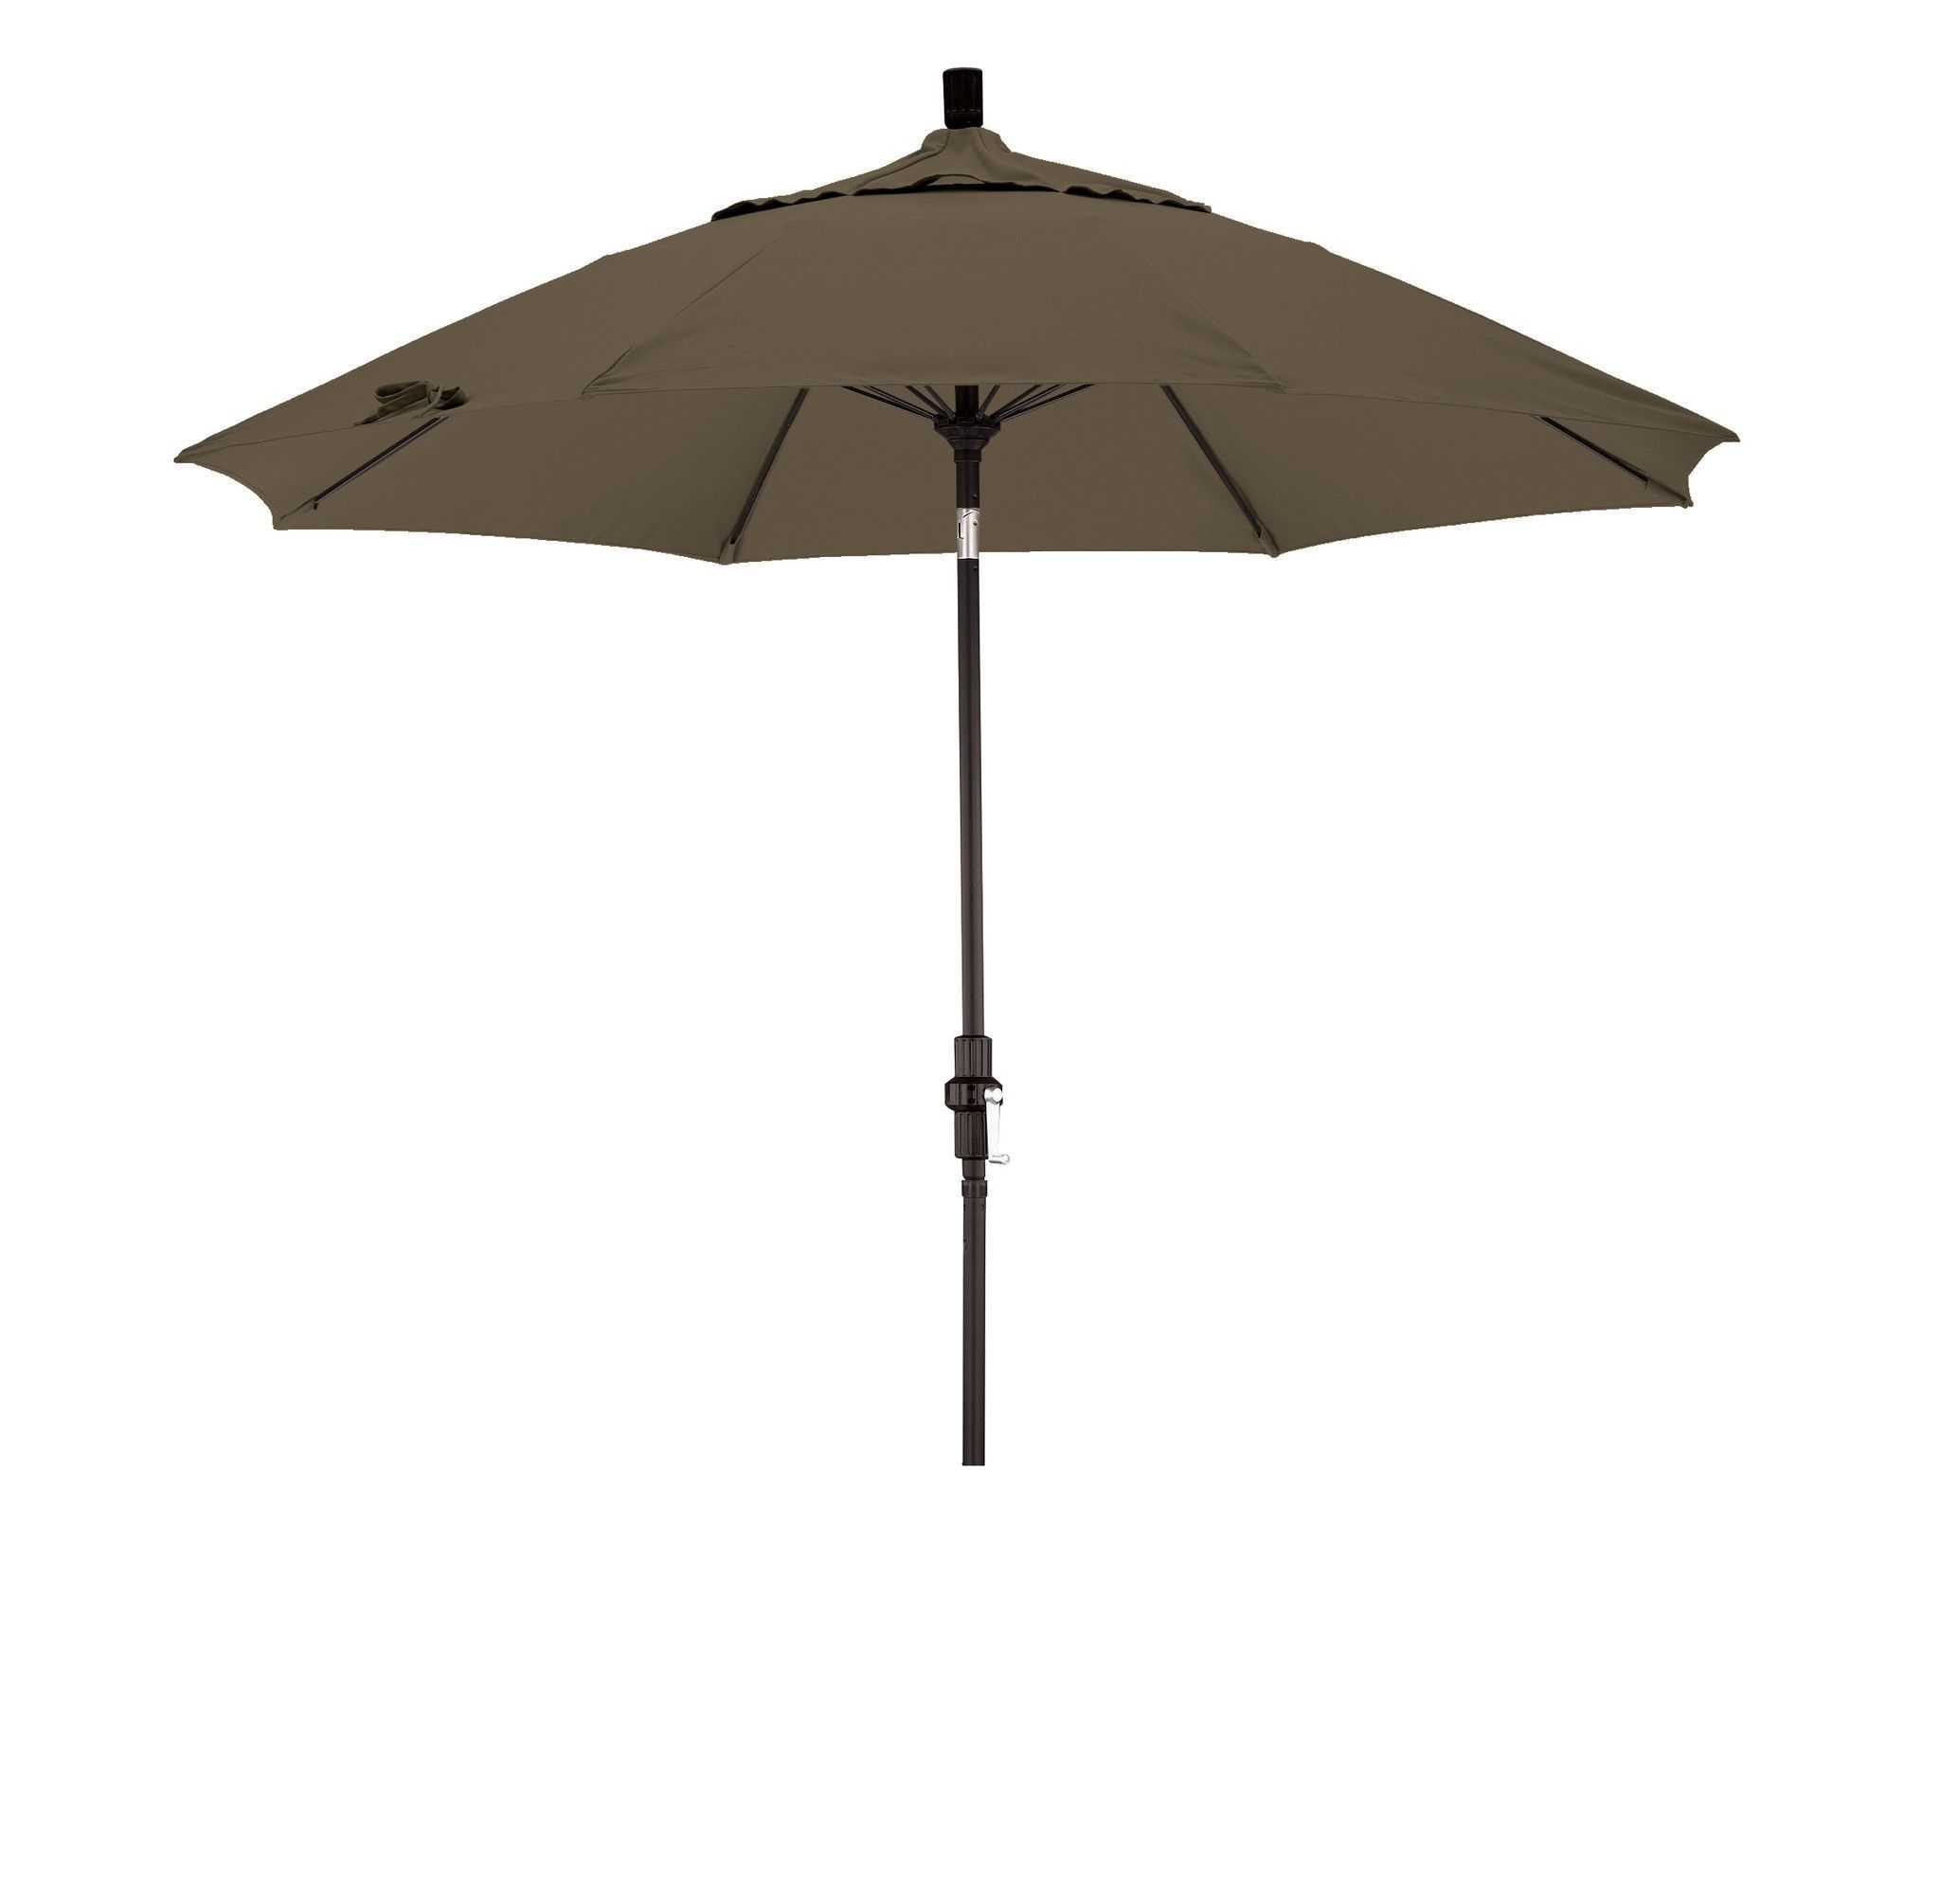 Favorite Eclipse Collection 9' Fiberglass Market Umbrella Collar Tilt M Black Regarding Sunbrella Teak Umbrellas (View 6 of 20)